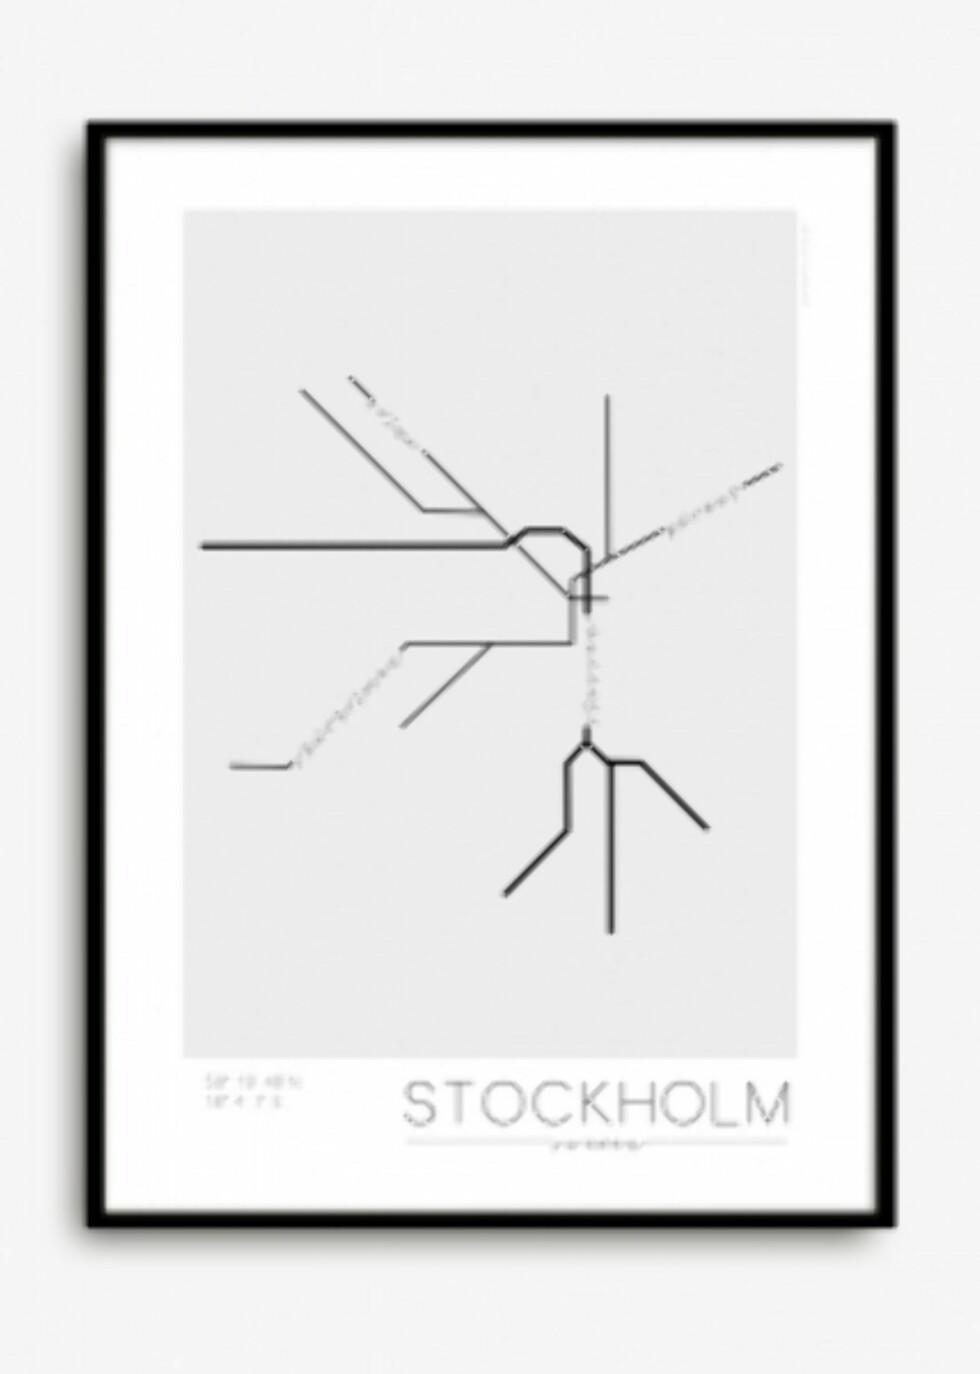 Stockholm Underground-plakat fra Woroom.no | kr 200 | https://track.adtraction.com/t/t?a=1124130996&as=1115634940&t=2&tk=1&url=http://www.woroom.no/products/stockholm-underground-plakat